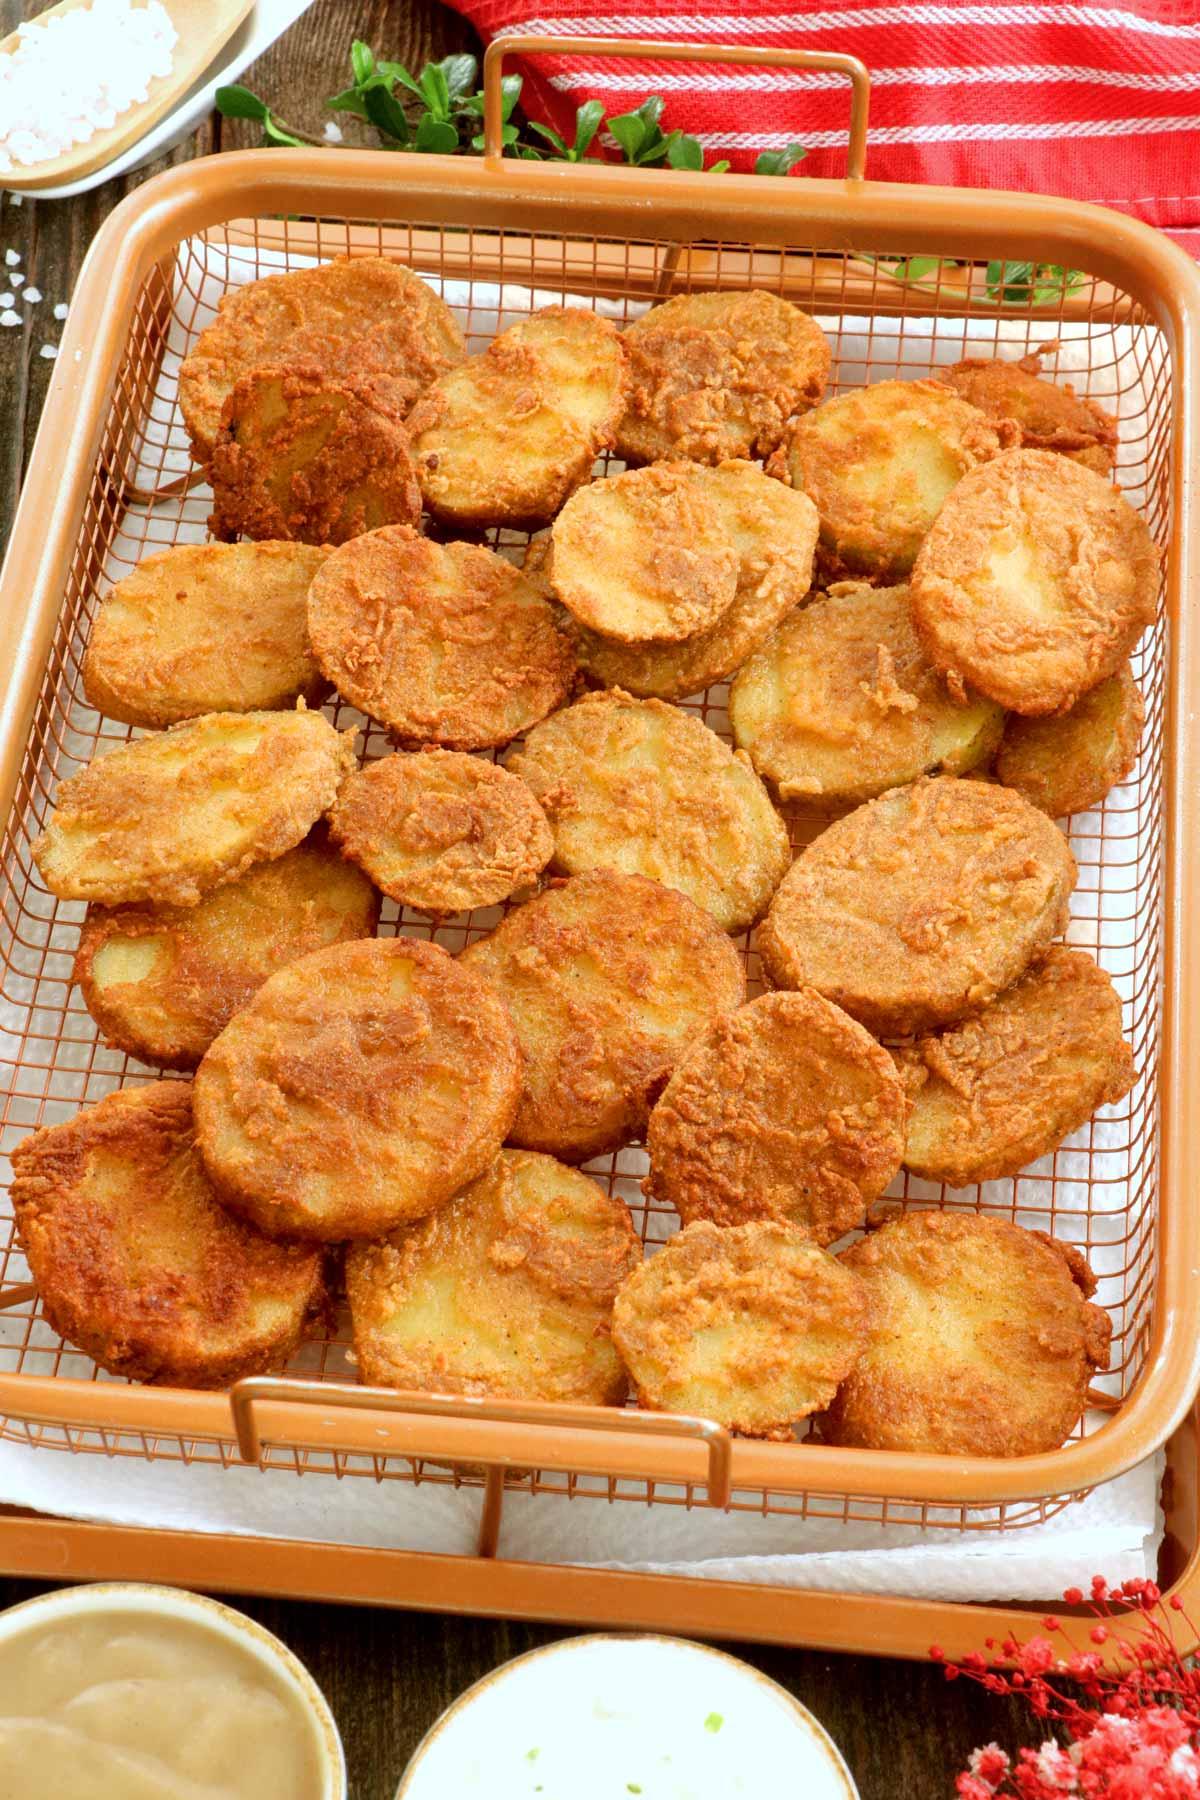 Freshly fried crispy mojo potatoes.